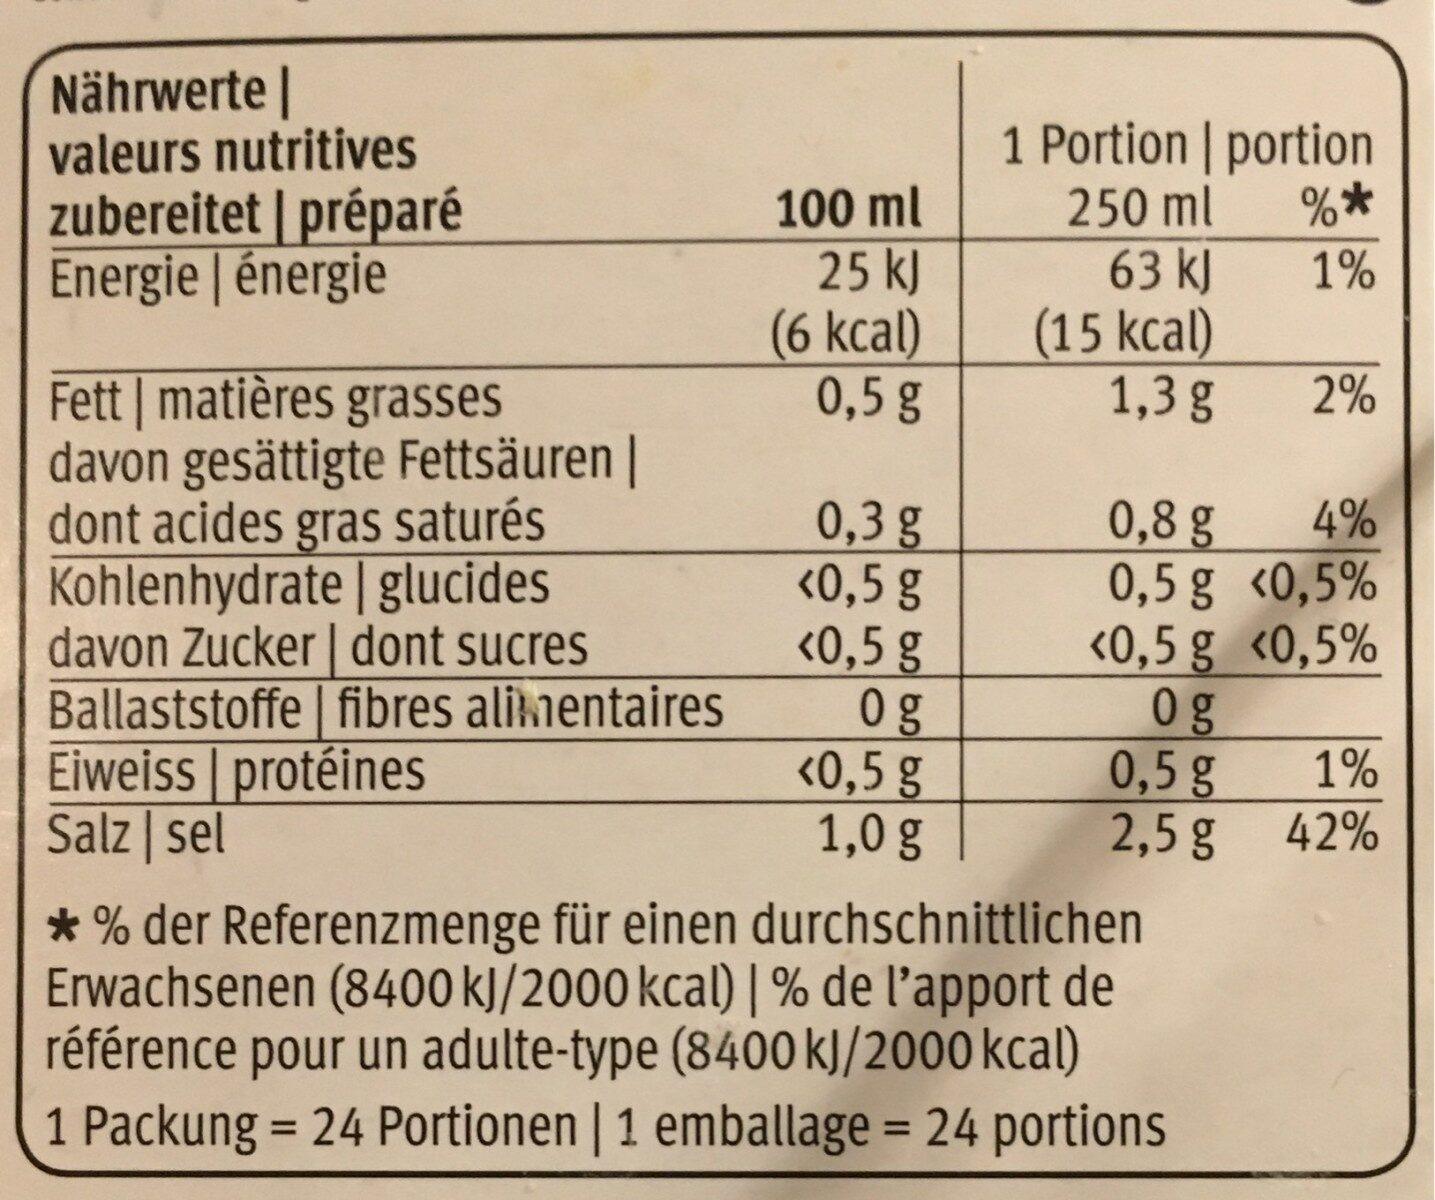 Bouillon de poule - Informazioni nutrizionali - fr